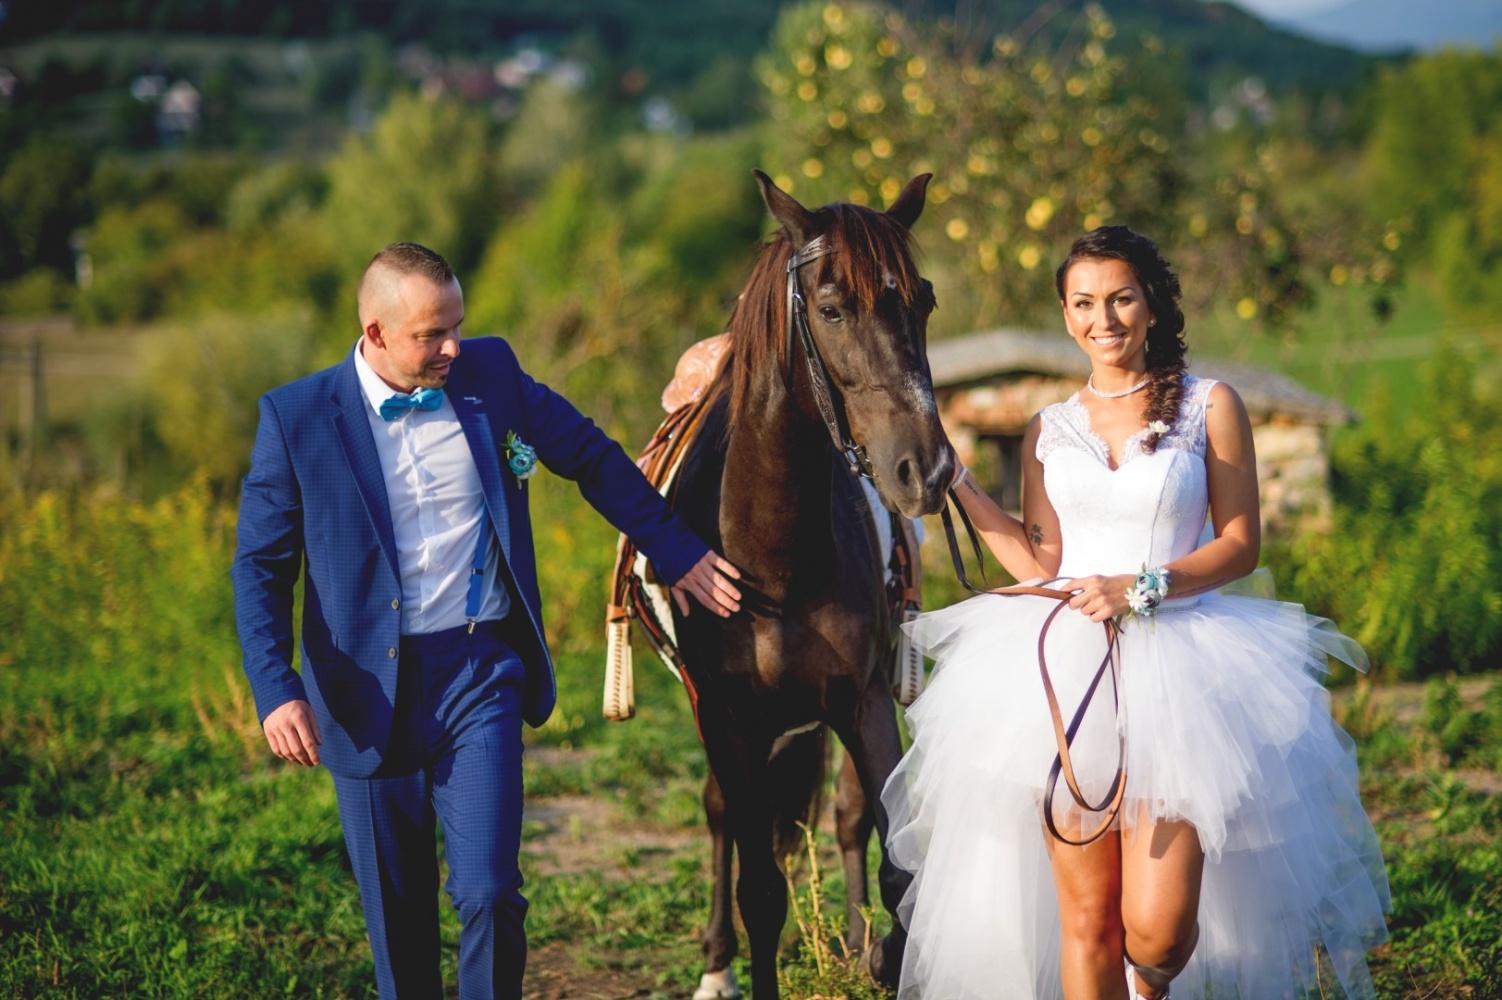 http://www.fotoz.sk/images/gallery-37/normal/svadobny-fotograf_eskuvoi-fotos_lacny-fotograf_fotograf-na-svadbu_juraj-zsok_fotograf-nitra_fotograf-galanta_juraj-zsok092.jpg